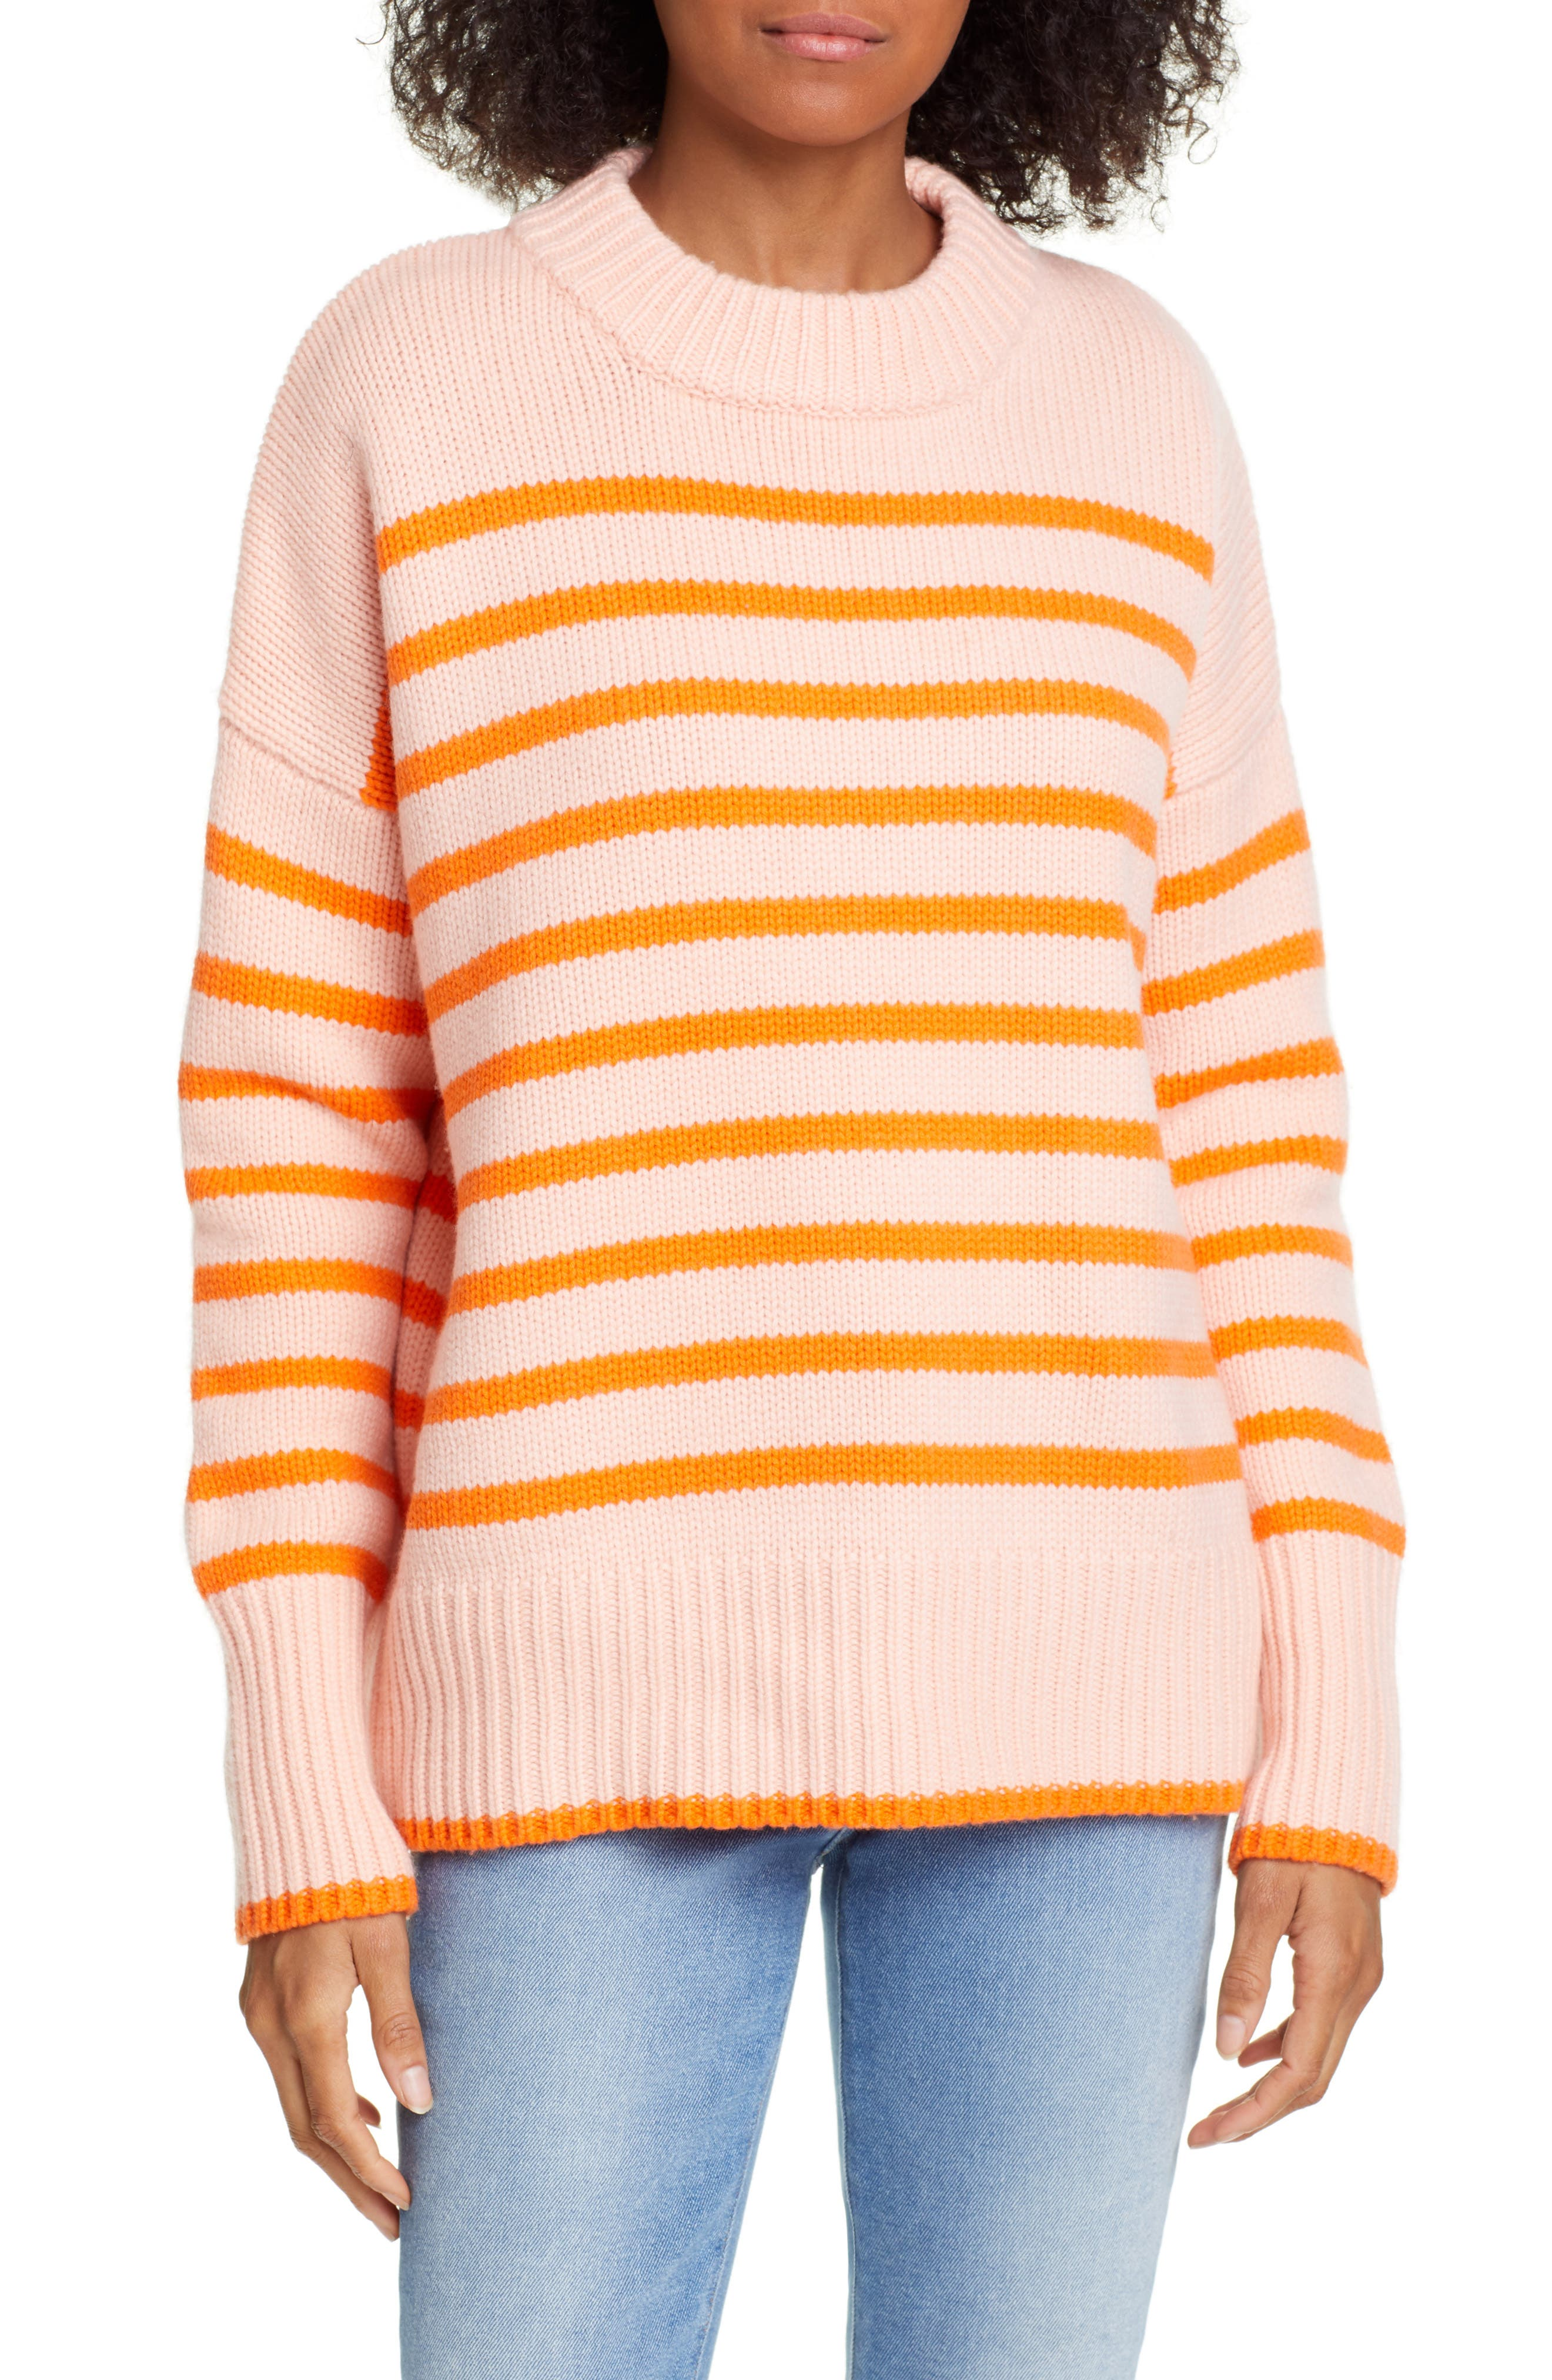 Marin Wool & Cashmere Sweater, Main, color, PEACH/ ORANGE